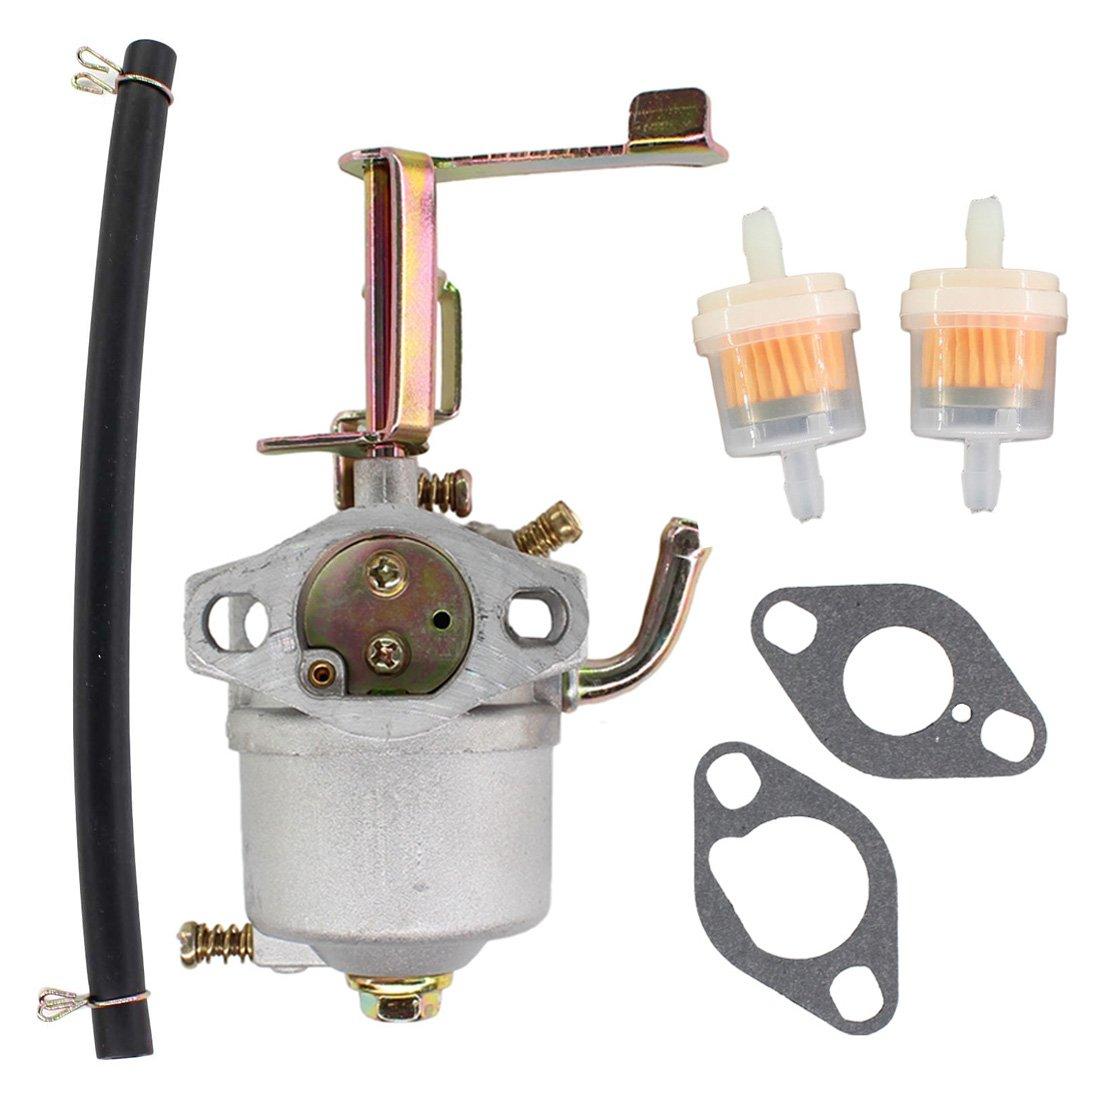 Carburetor for UST 1200 1350 Watts GG1200 GG1350 Generator PW2000 2000PSI Washer